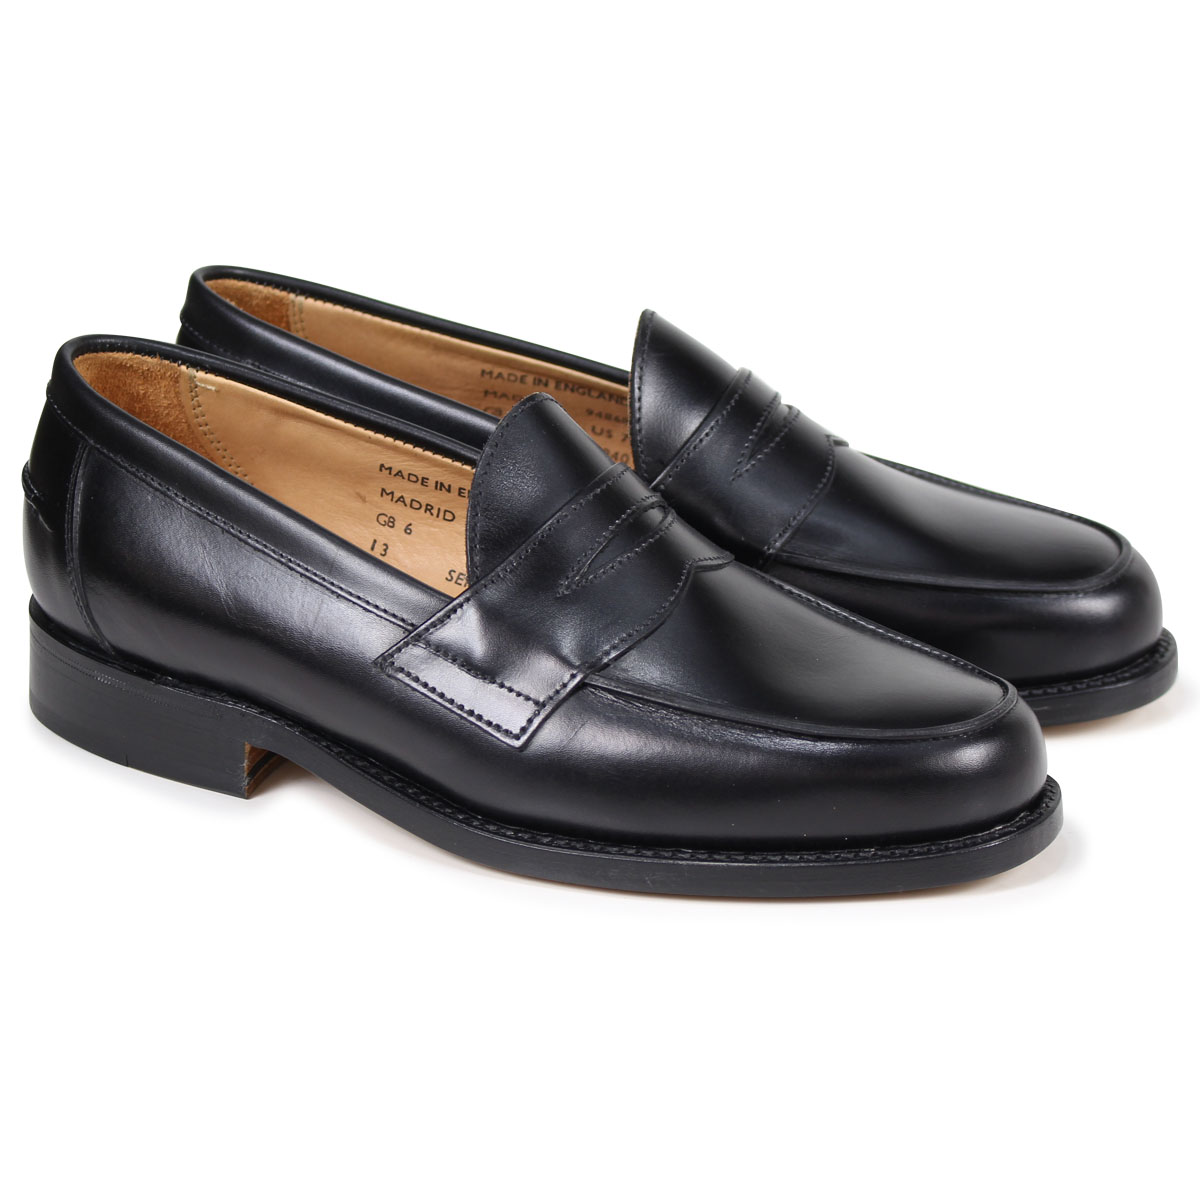 SANDERS MADRID BUTT SEAM LOAFER サンダース 靴 ペニーローファー メンズ ブラック 9486B